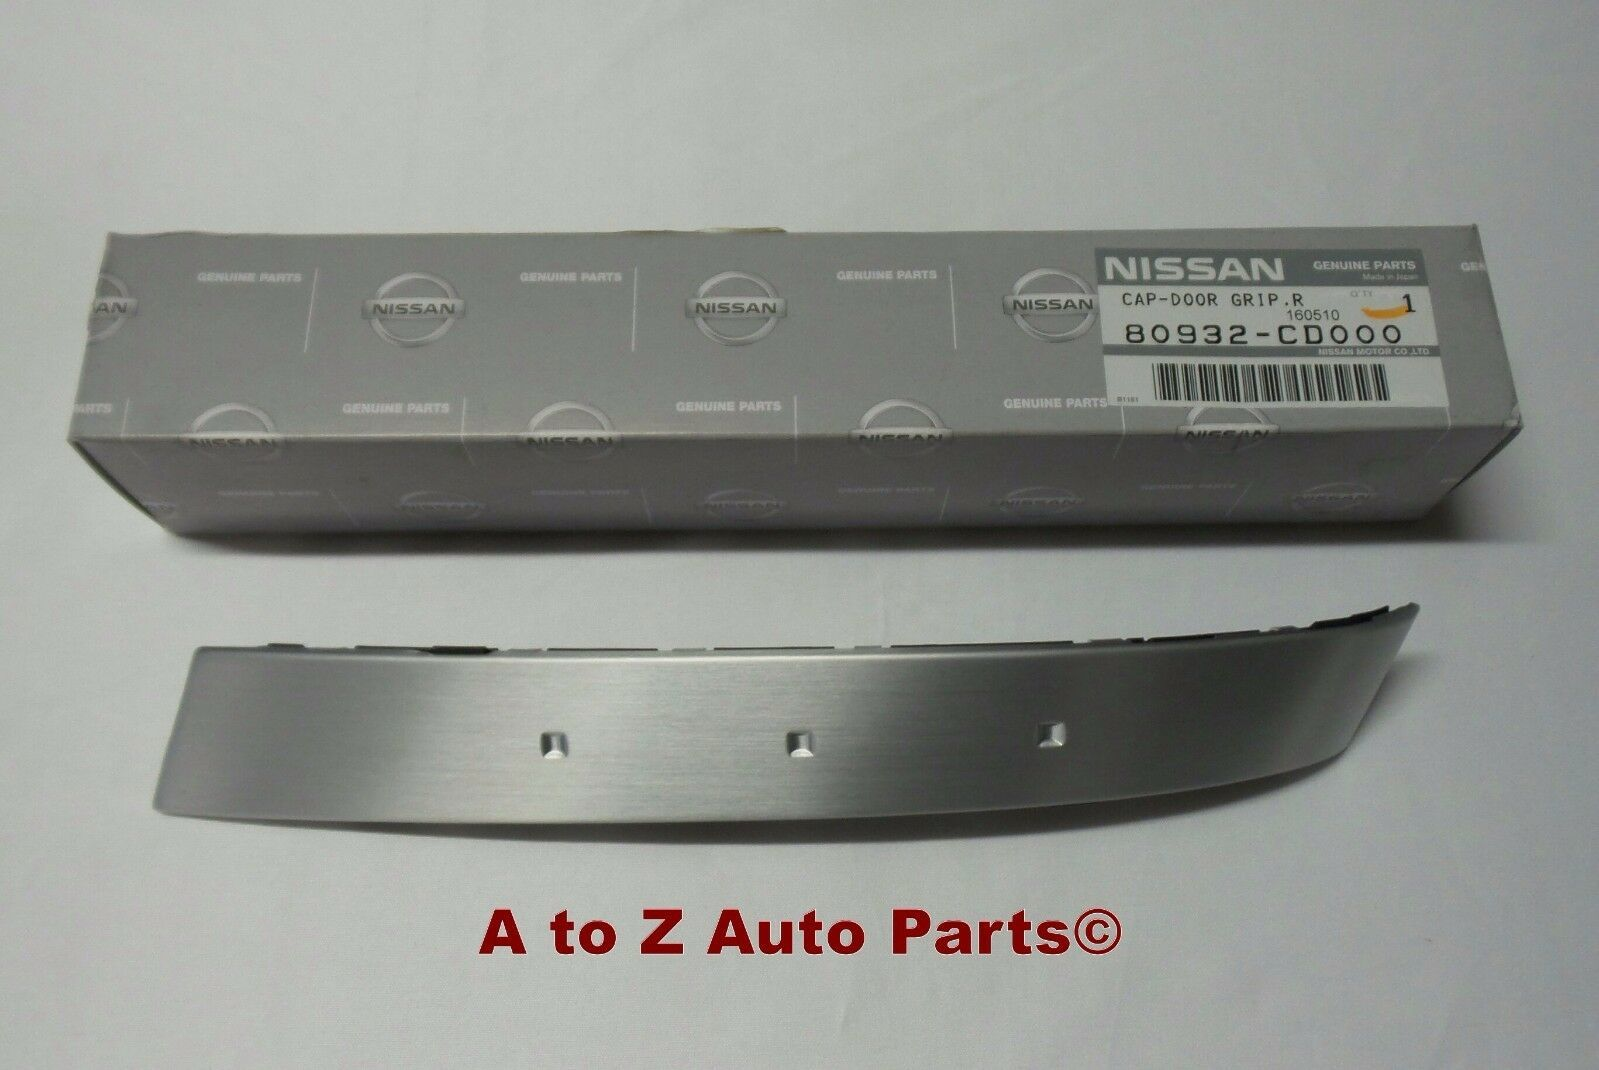 NEW 2003-2005 Nissan 350Z PASSENGER Side SILVER Door Pull Handle Insert, OEM! - $104.95